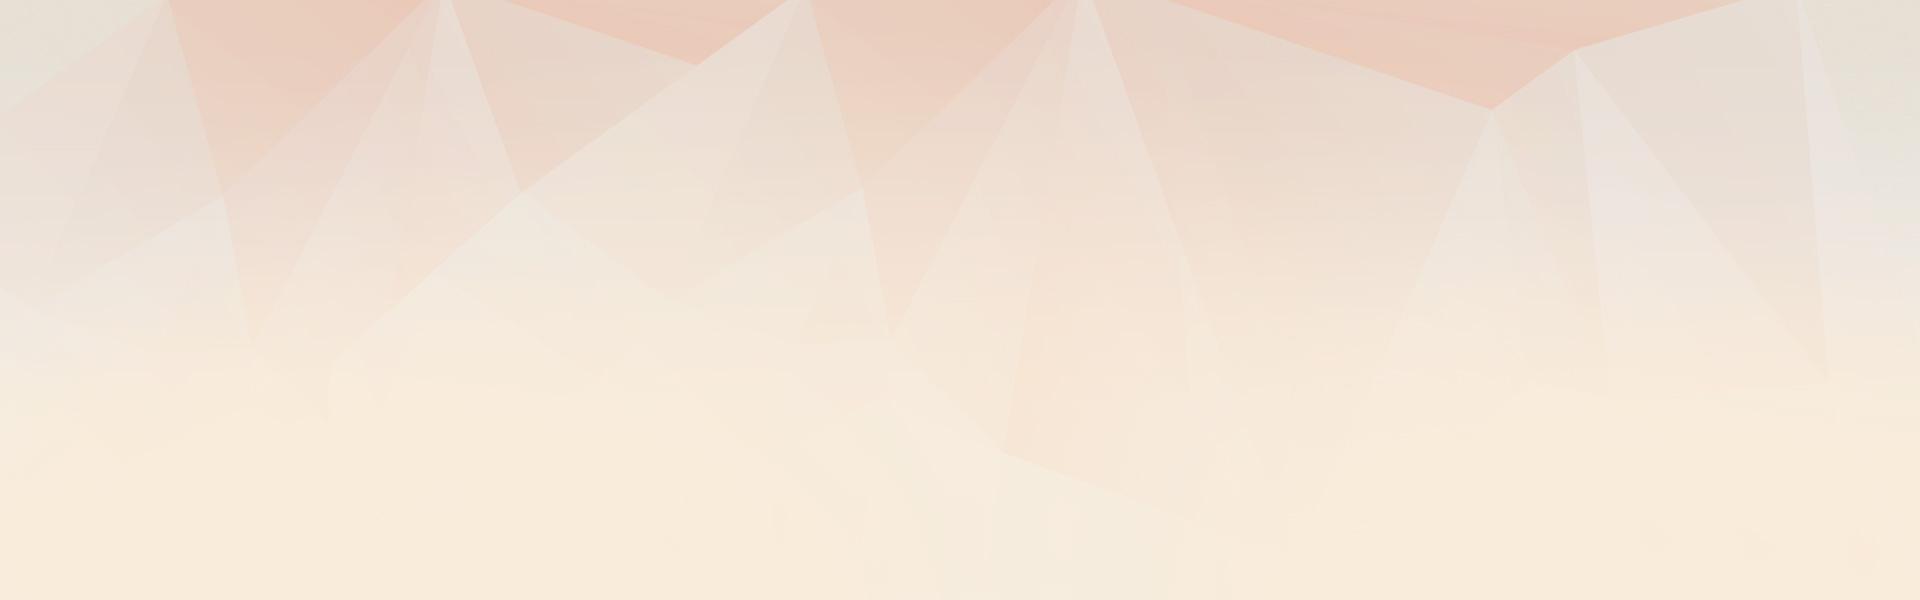 CTA_Backgrounds-01_02